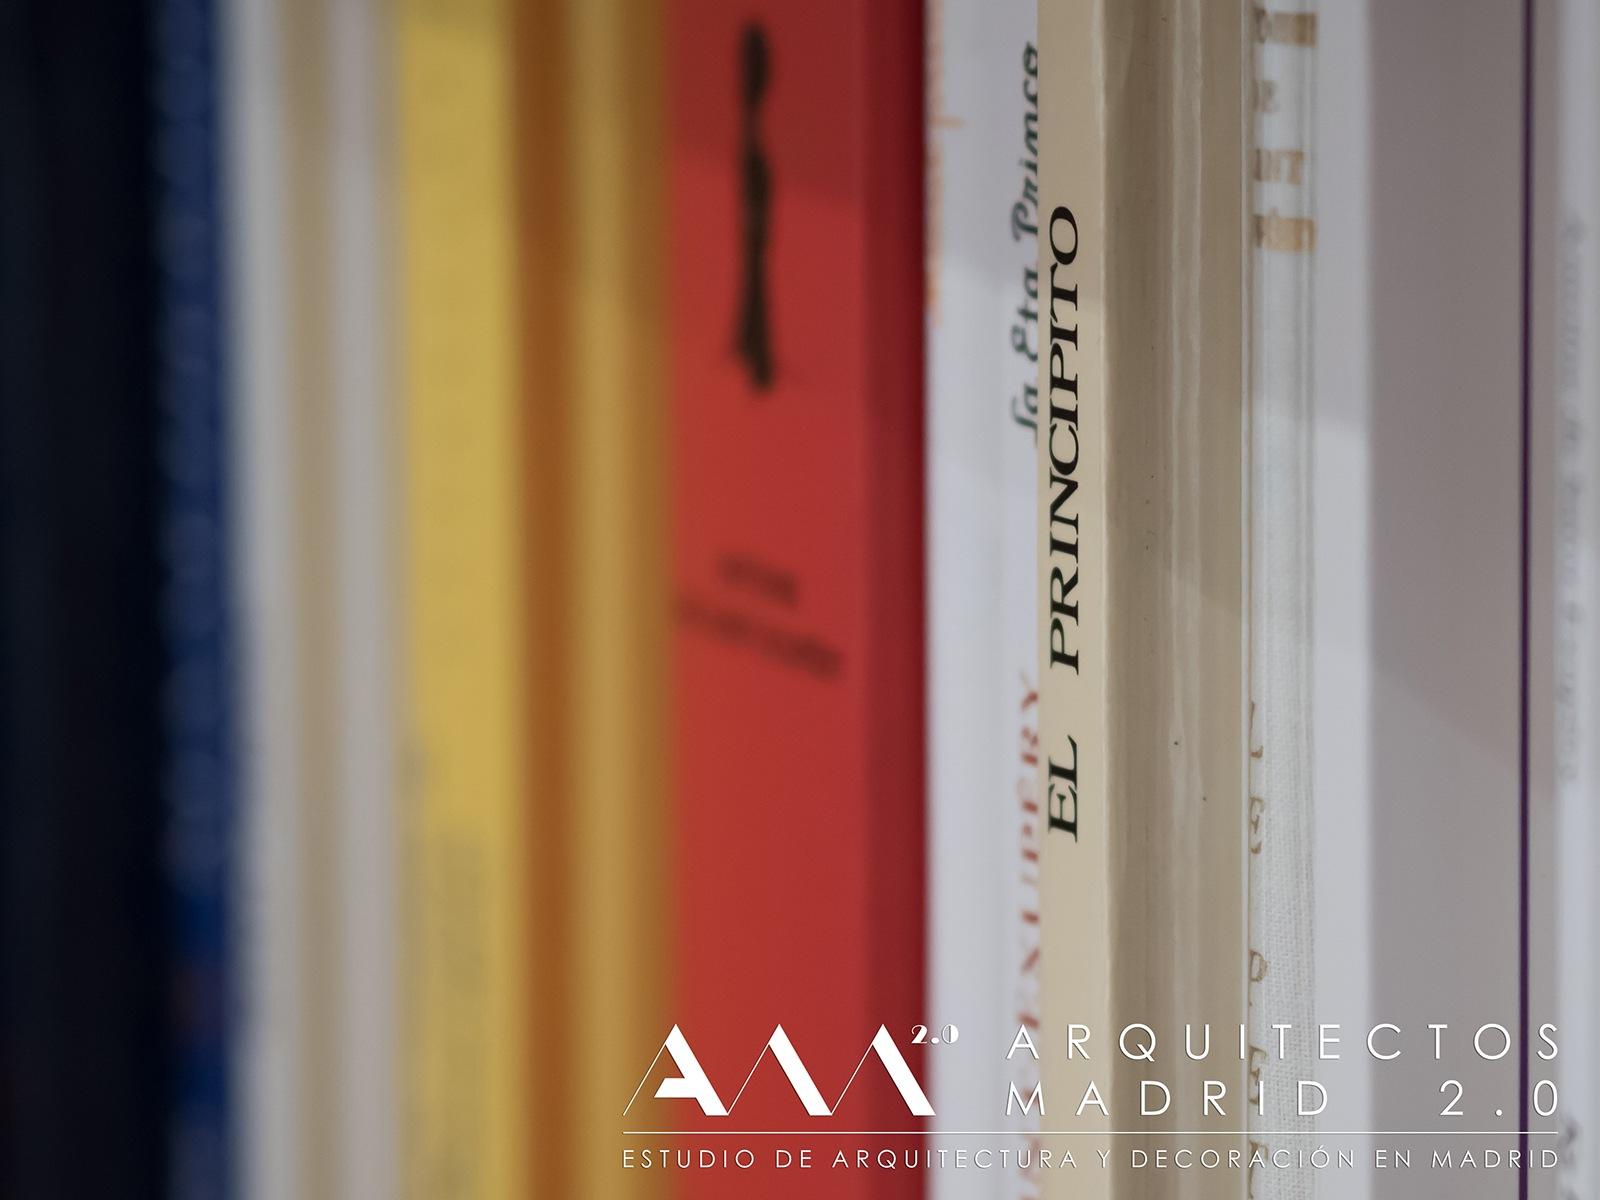 ideas-reformas-pisos-pequenos-viviendas-casas-decoracion-librerias-1